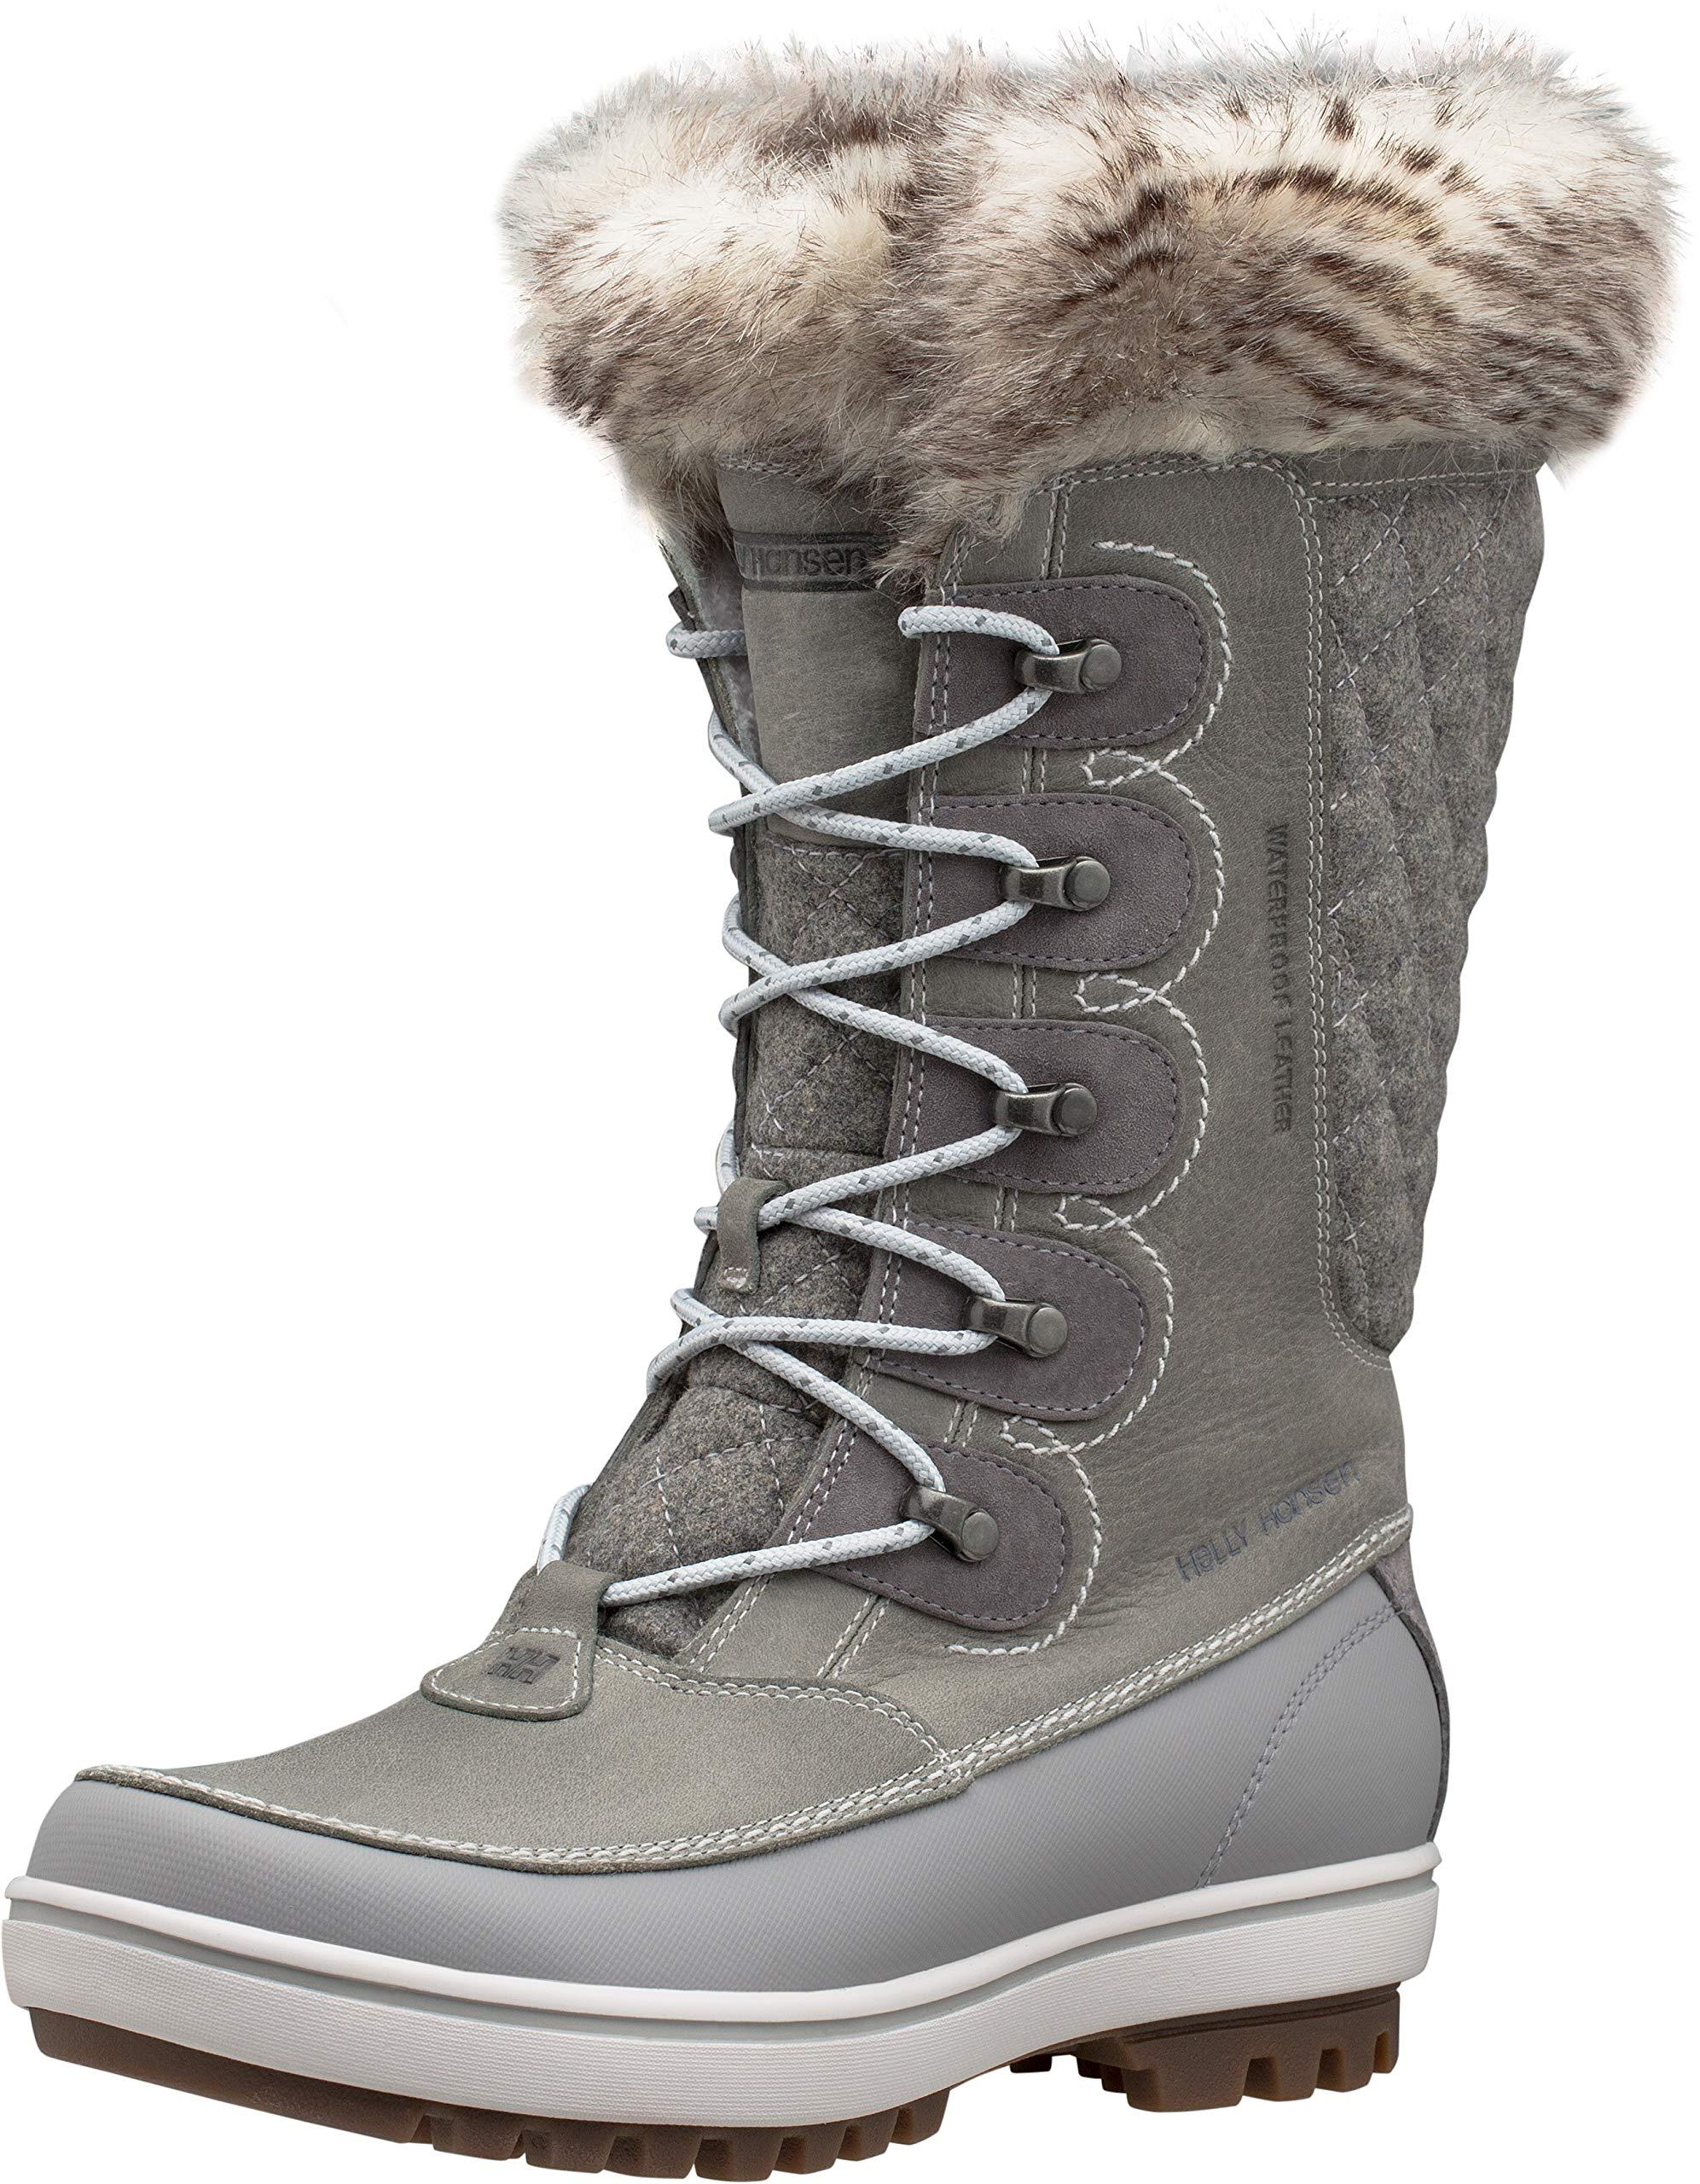 Helly Hansen Womens Garibaldi Boots